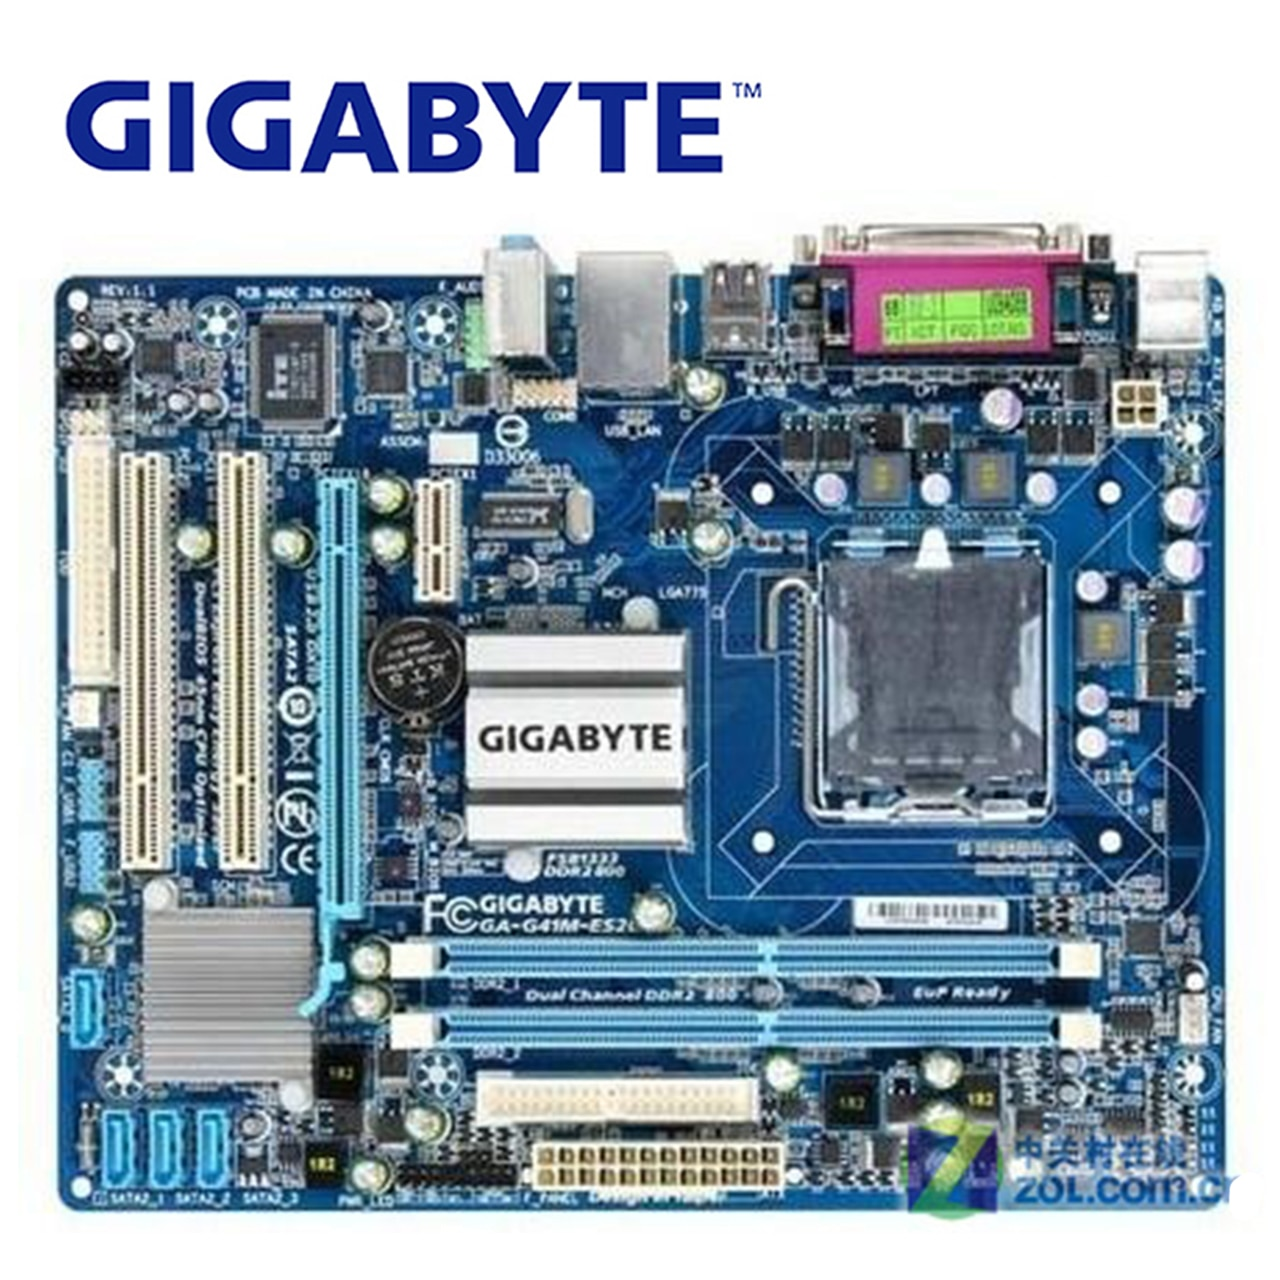 Lga 775 ddr2 para intel gigabyte GA-G41M-ES2L 100% original placa-mãe g41 G41M-ES2L desktop mainboard sata 2 systemboard usado